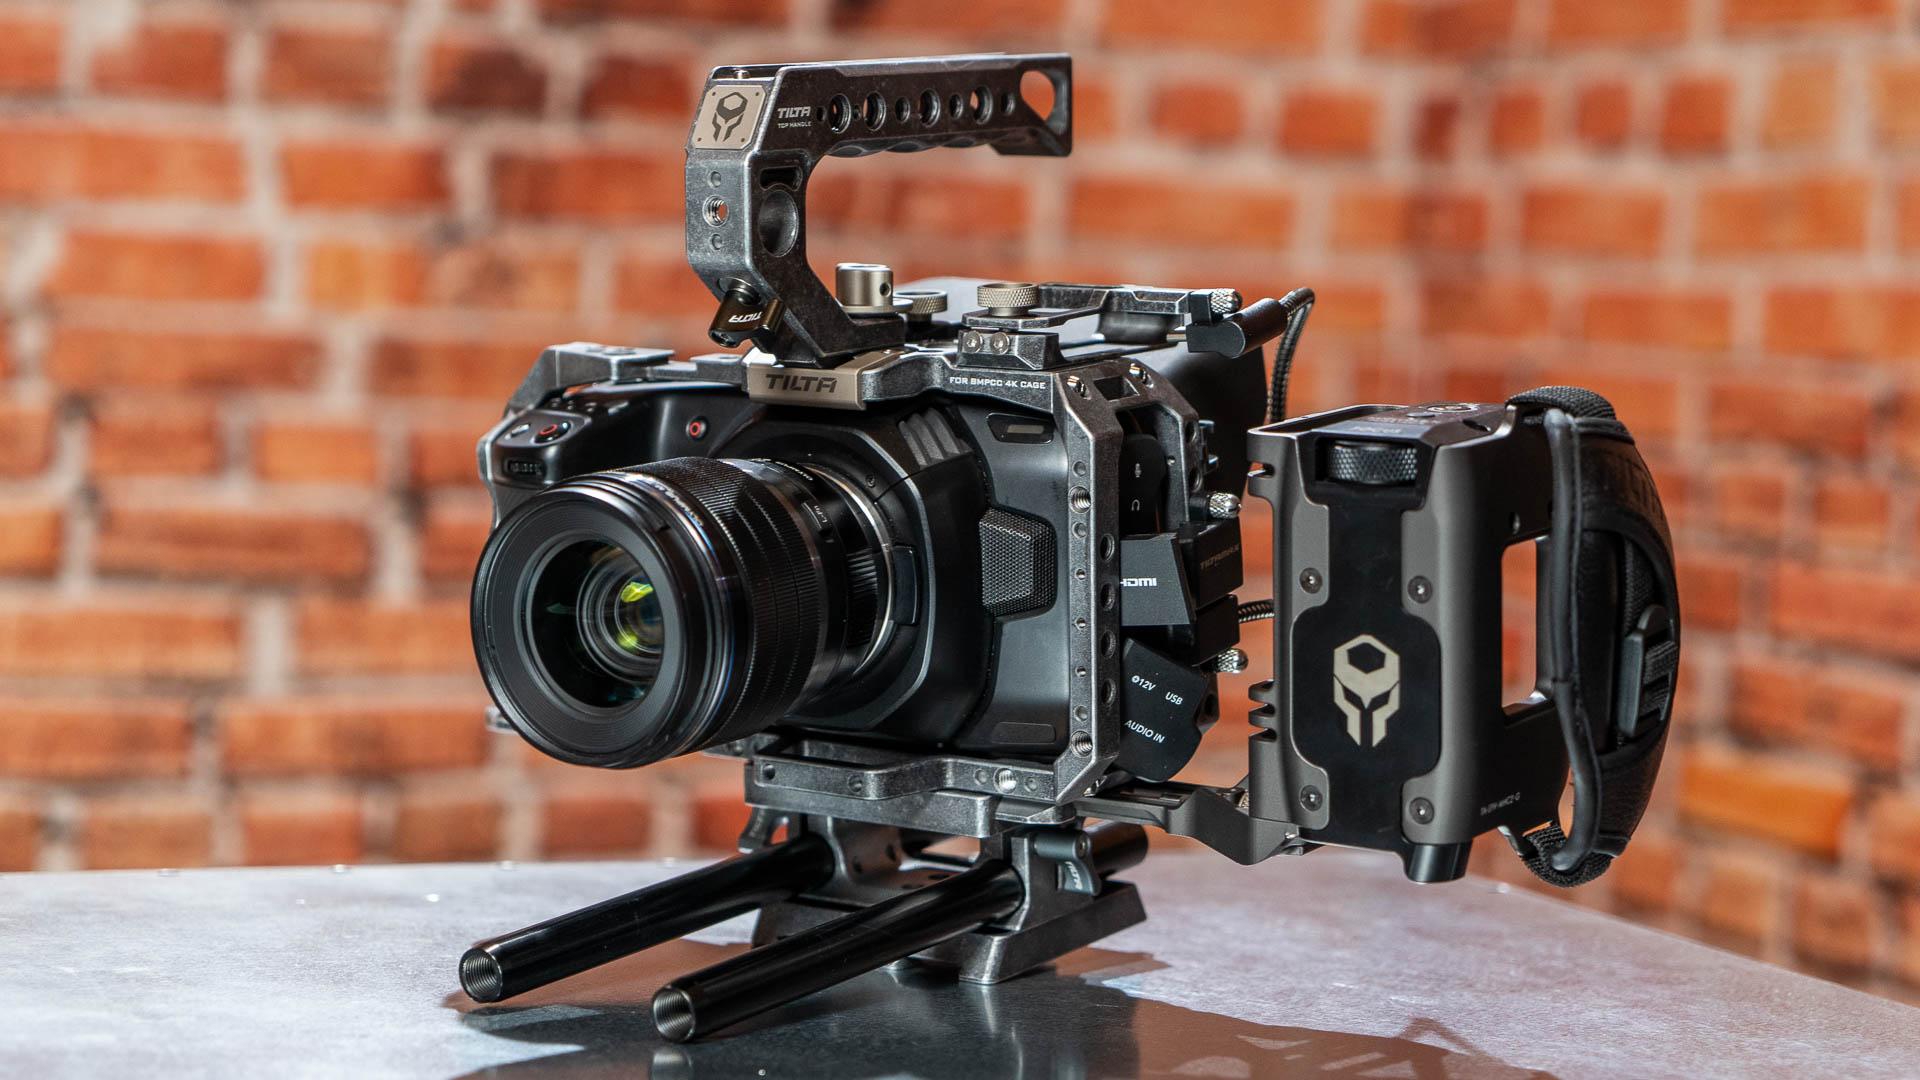 Ultimate Bmpcc 4k Cage Review And Shootout 8sinn Came Tv Smallrig Tilta Vocas Zacuto Filmmaker Resources